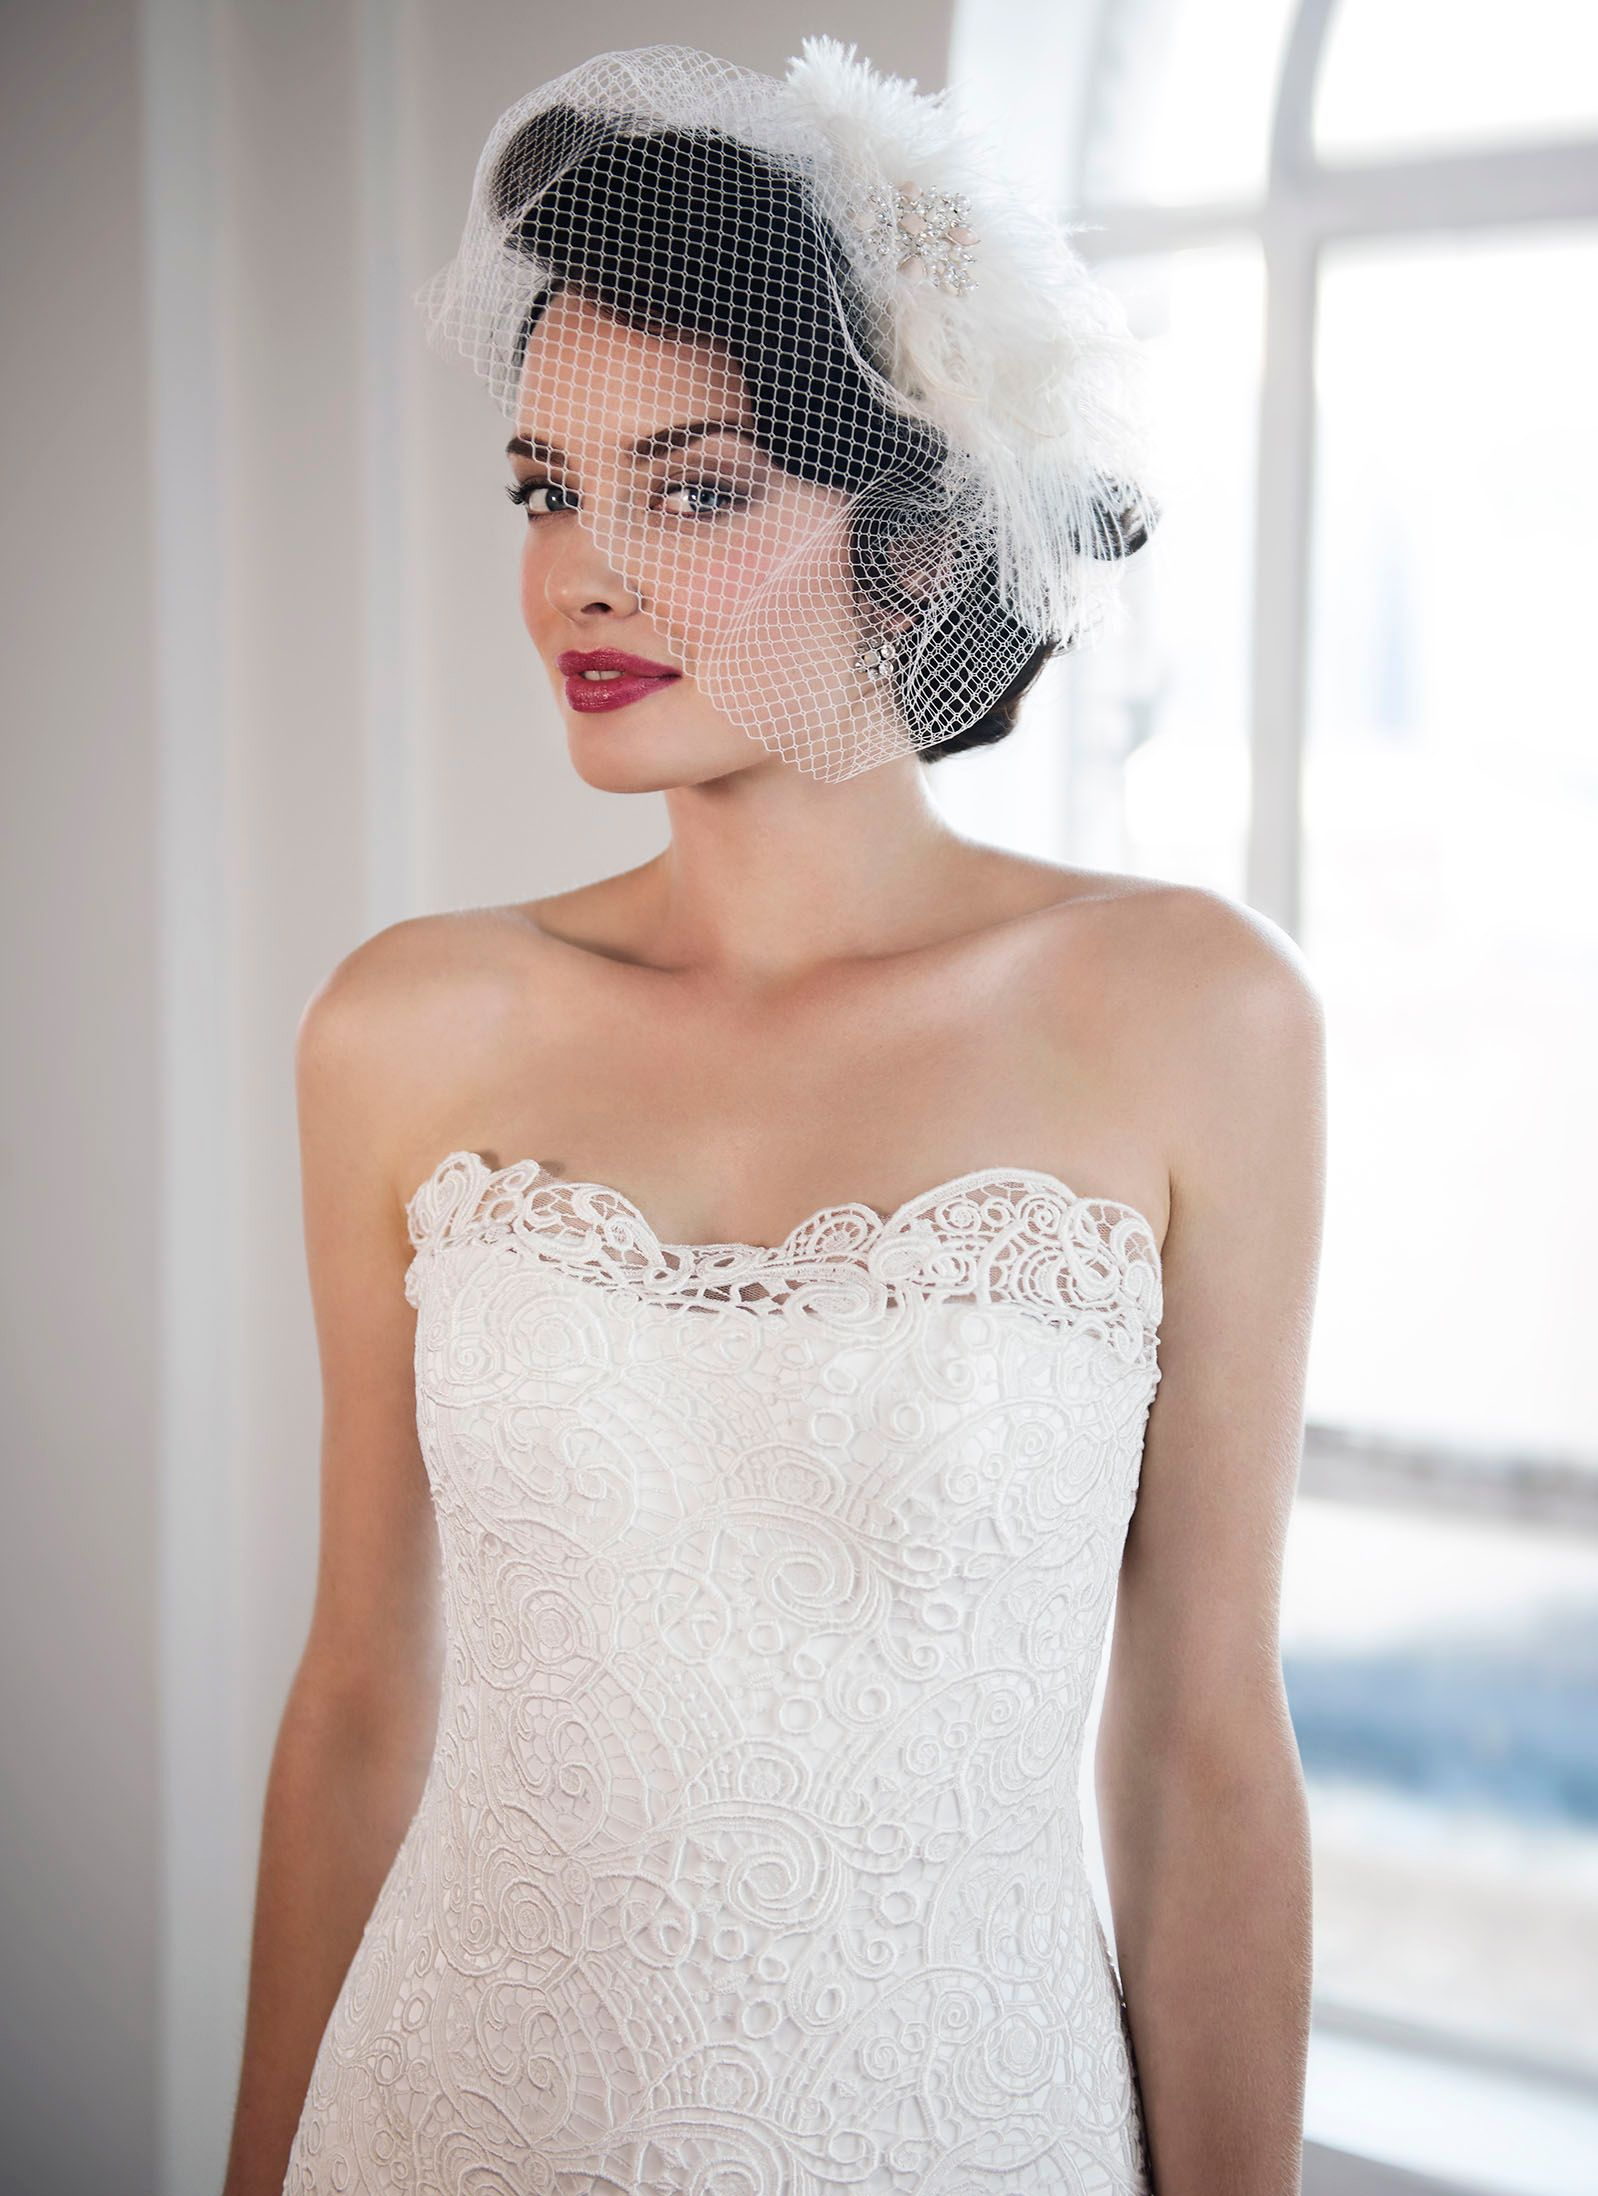 Medium Of Crochet Wedding Dress